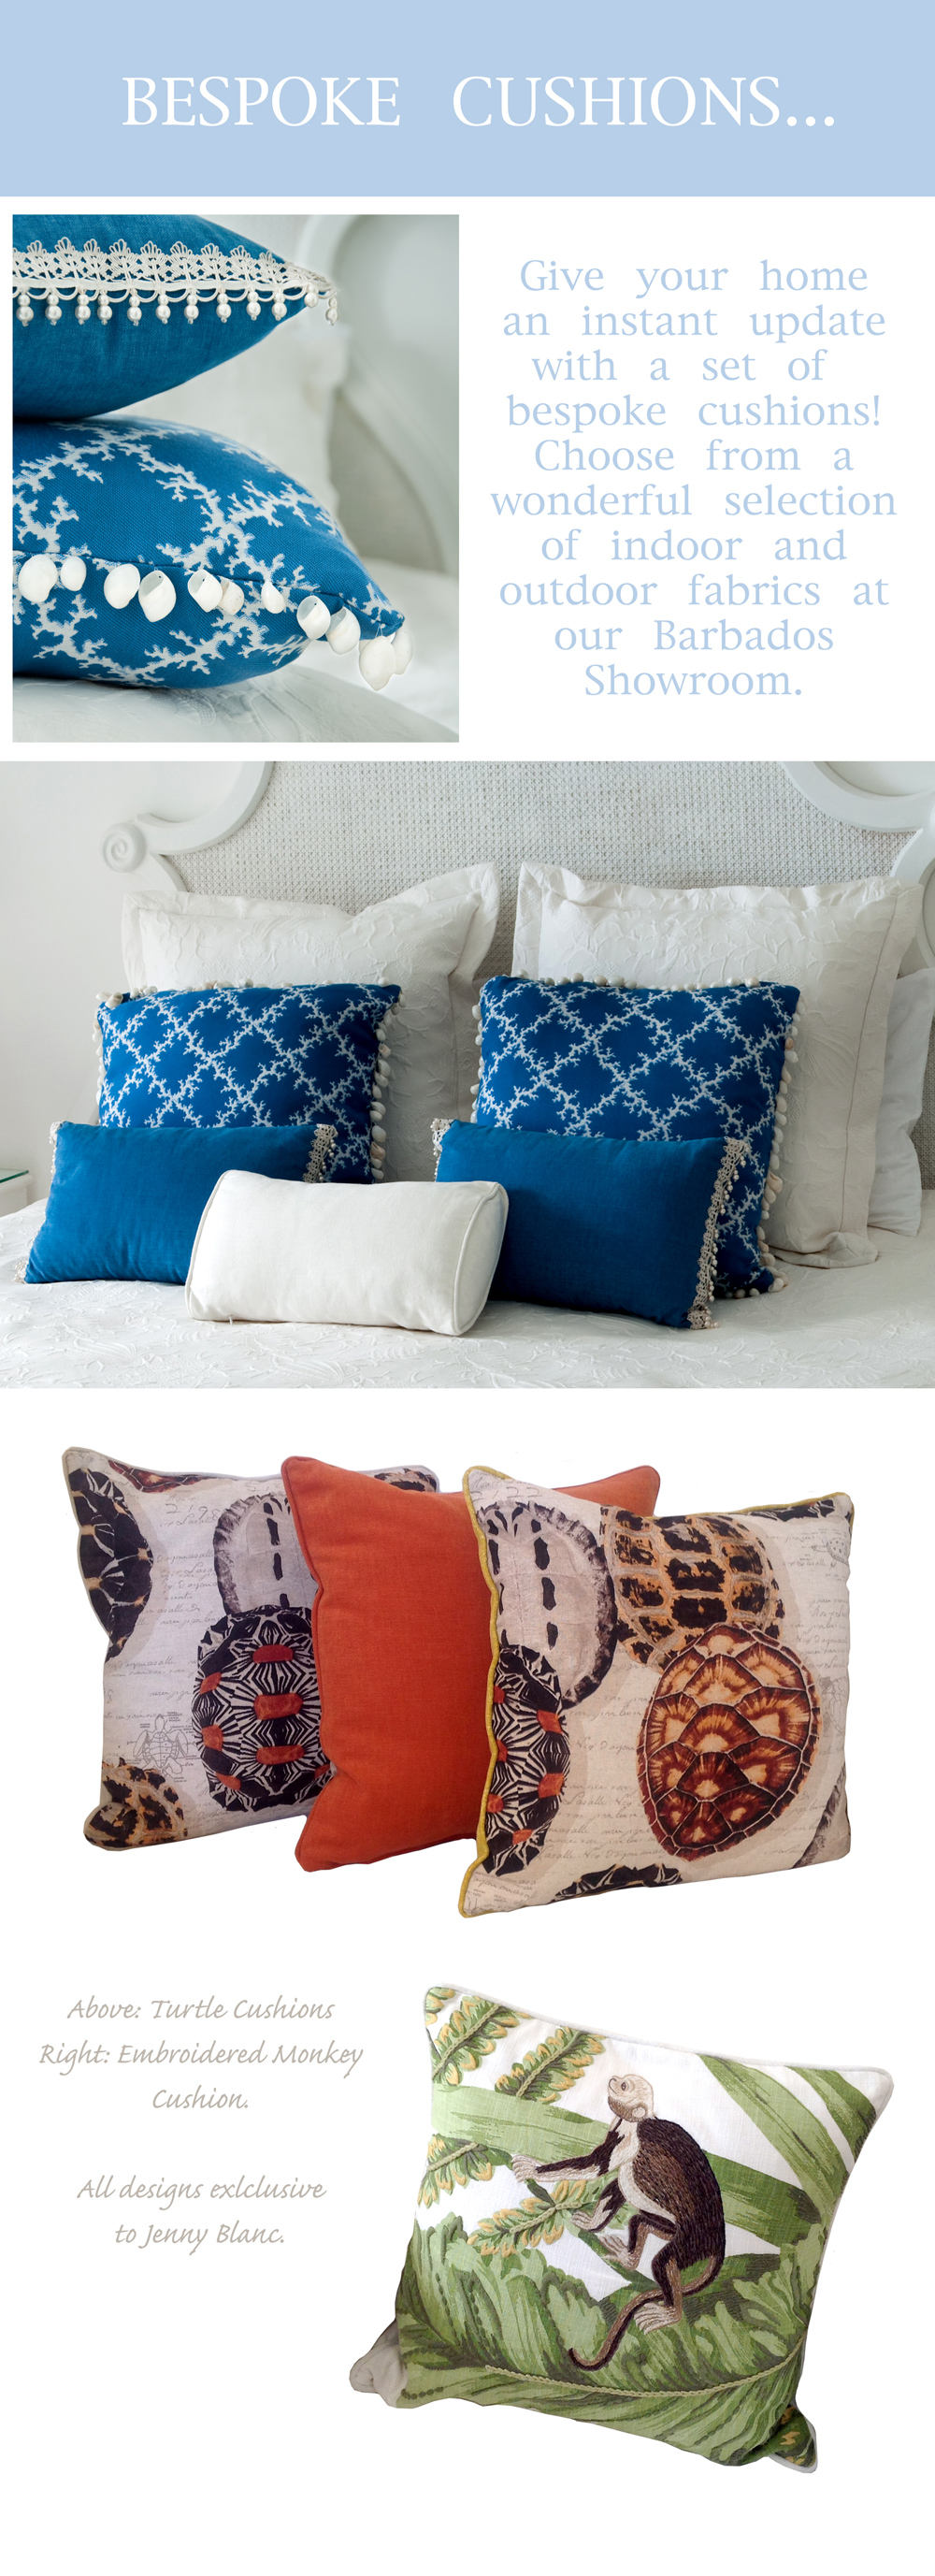 Jenny Blanc Blog - Bespoke Cushions